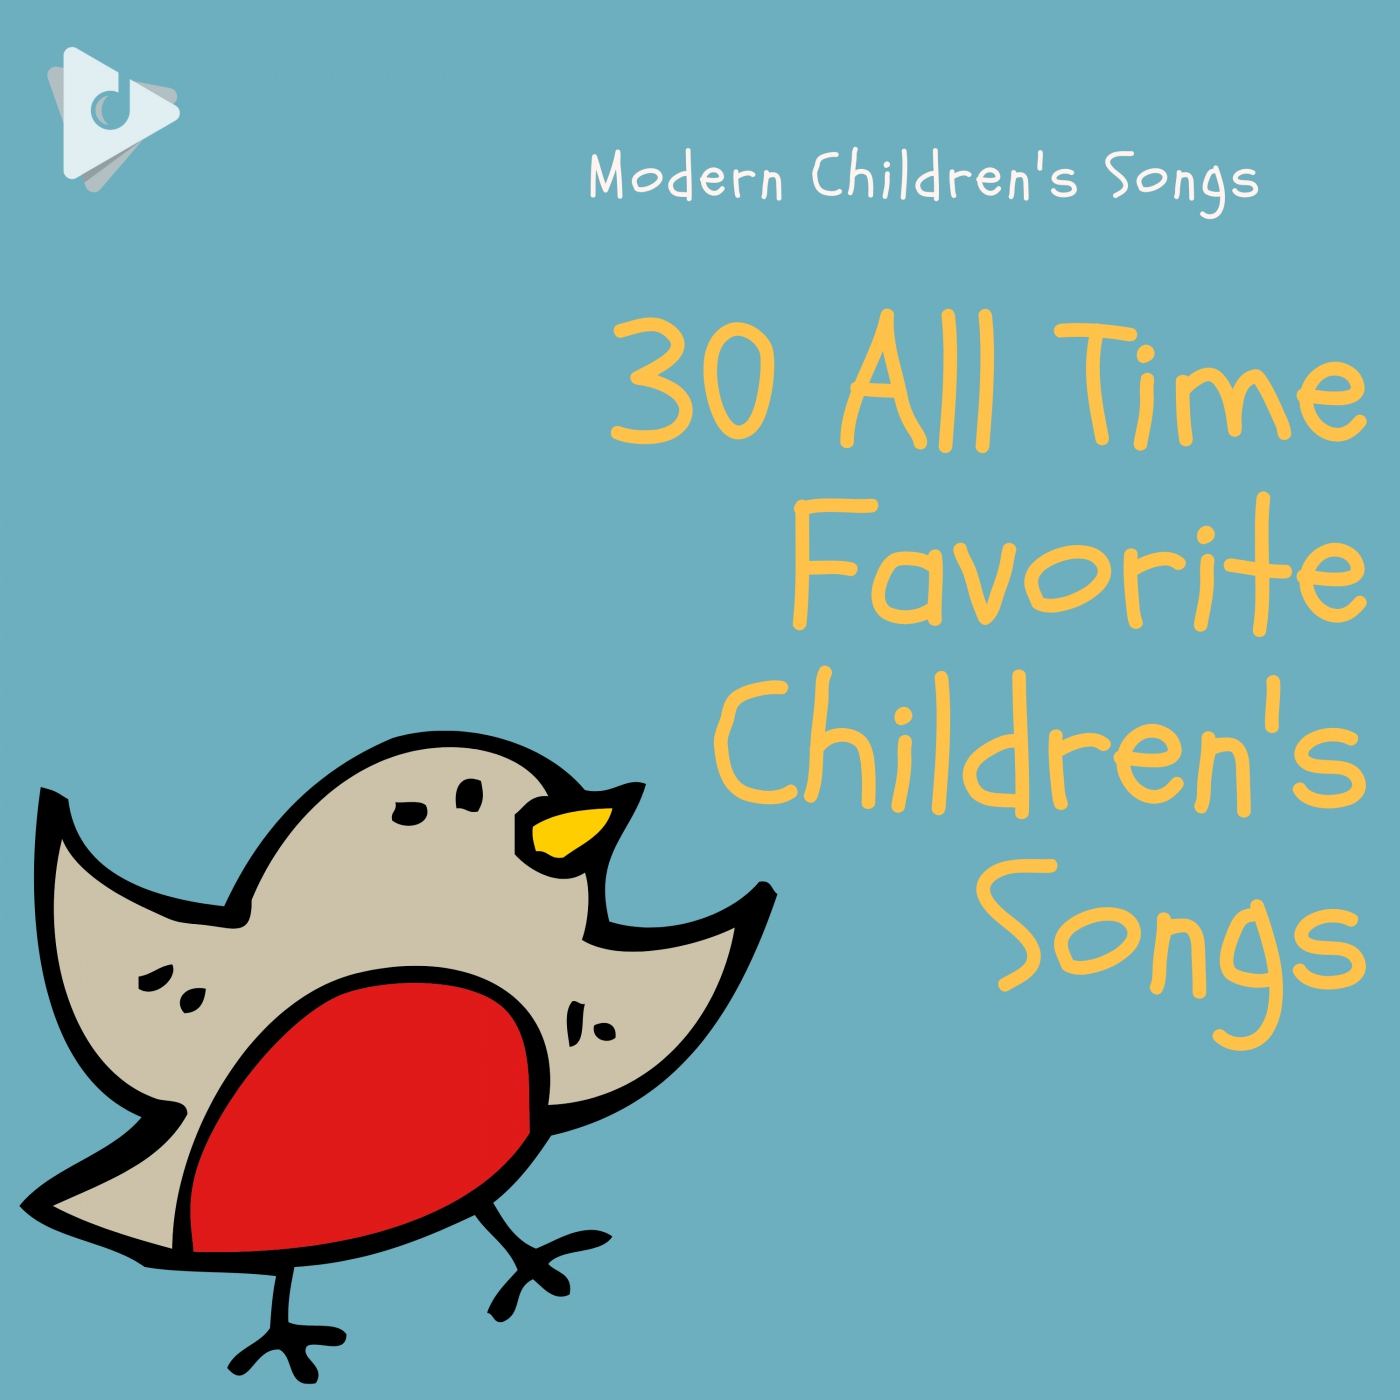 30 All Time Favorite Children's Songs